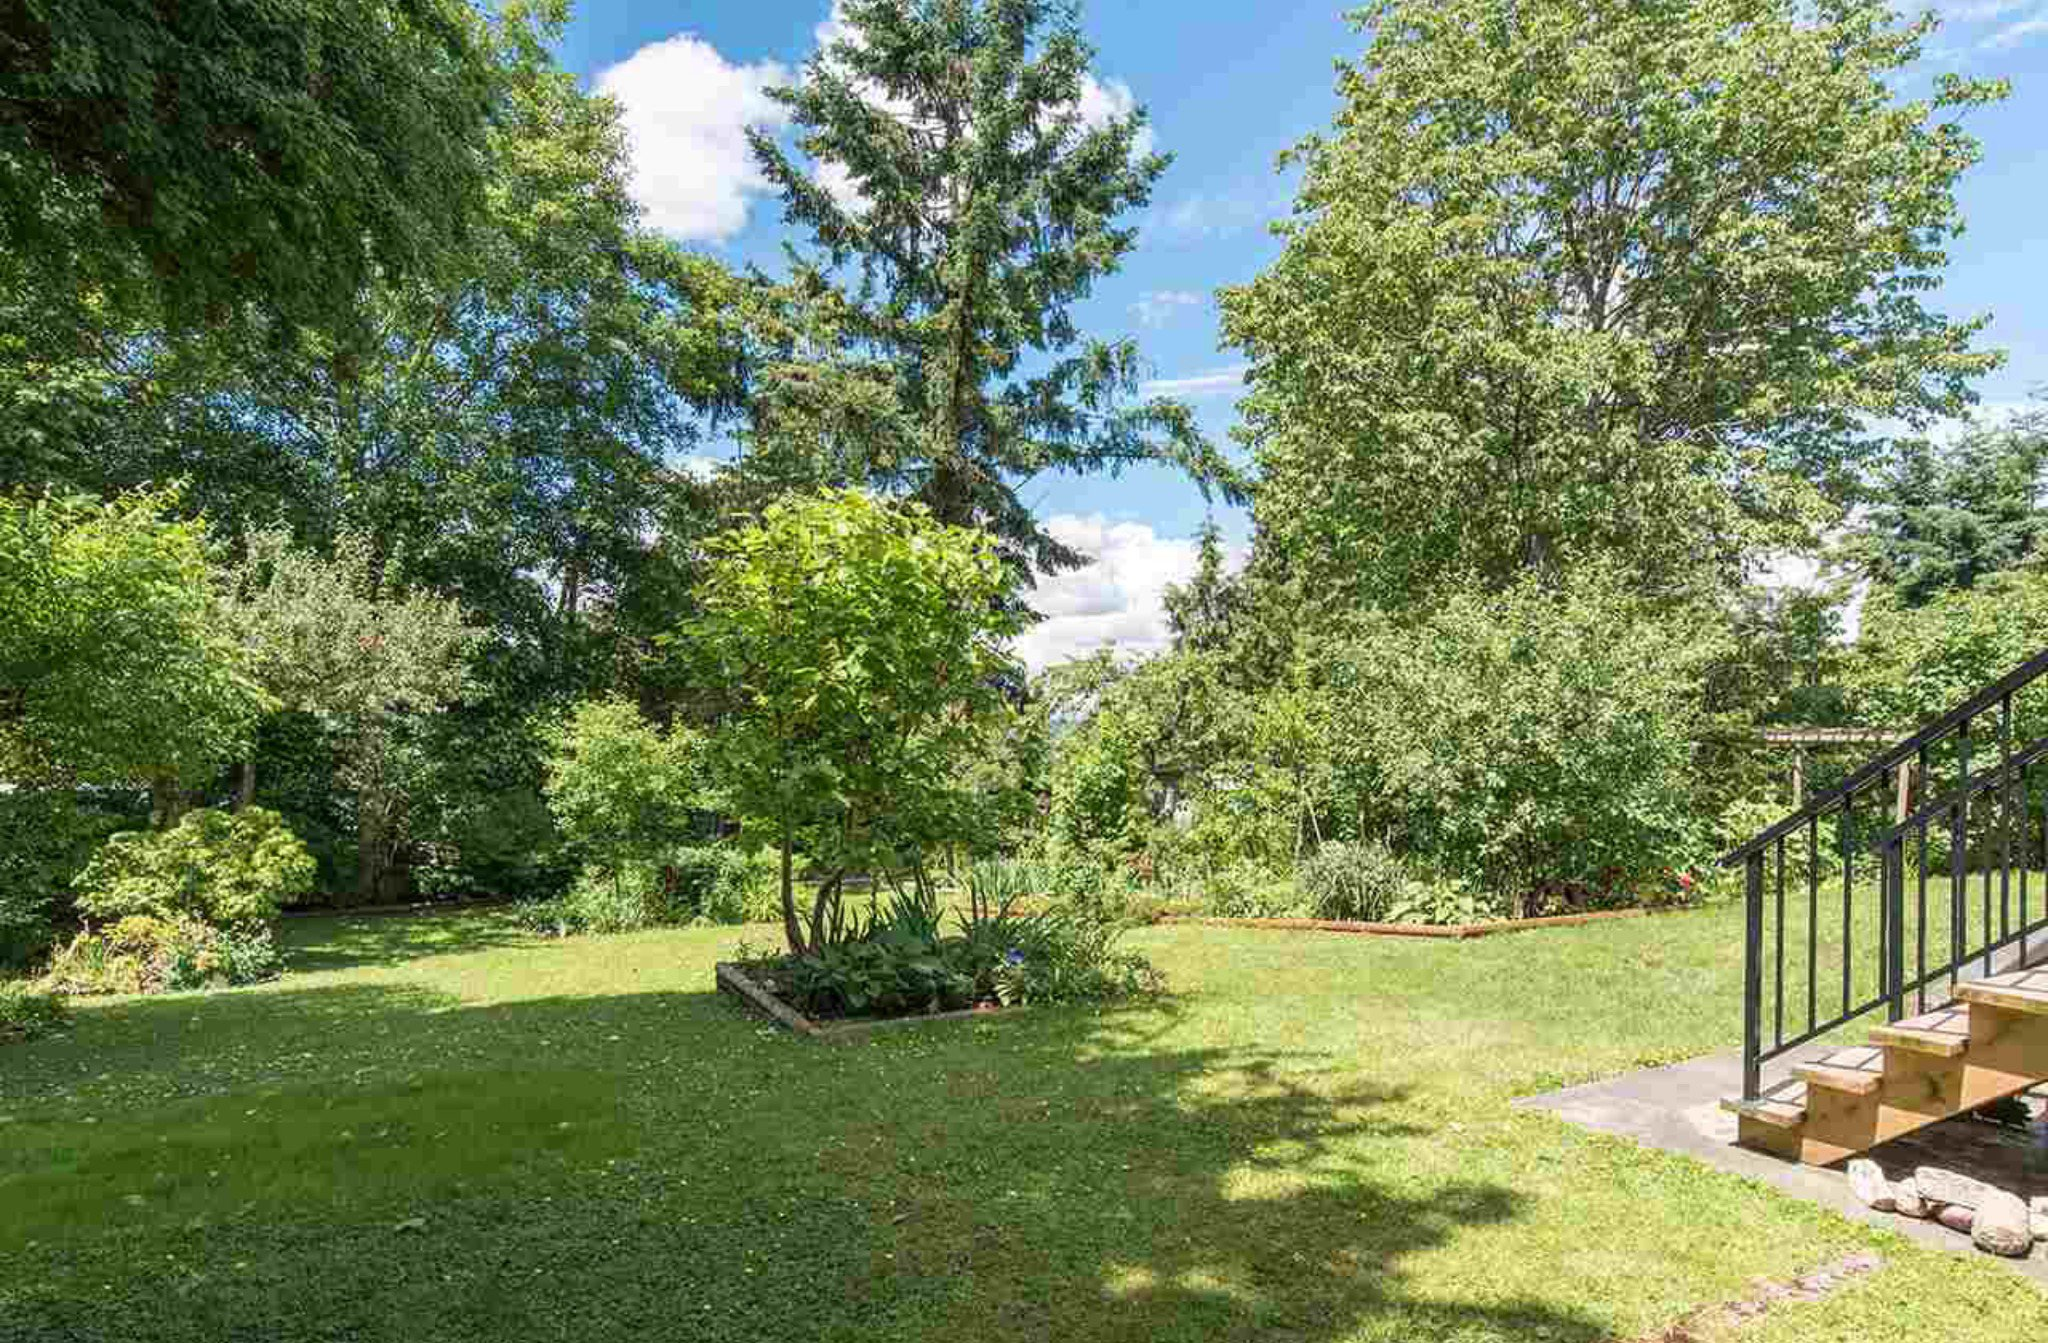 Photo 20: Photos: 10327 127A Street in Surrey: Cedar Hills House for sale : MLS®# R2178137